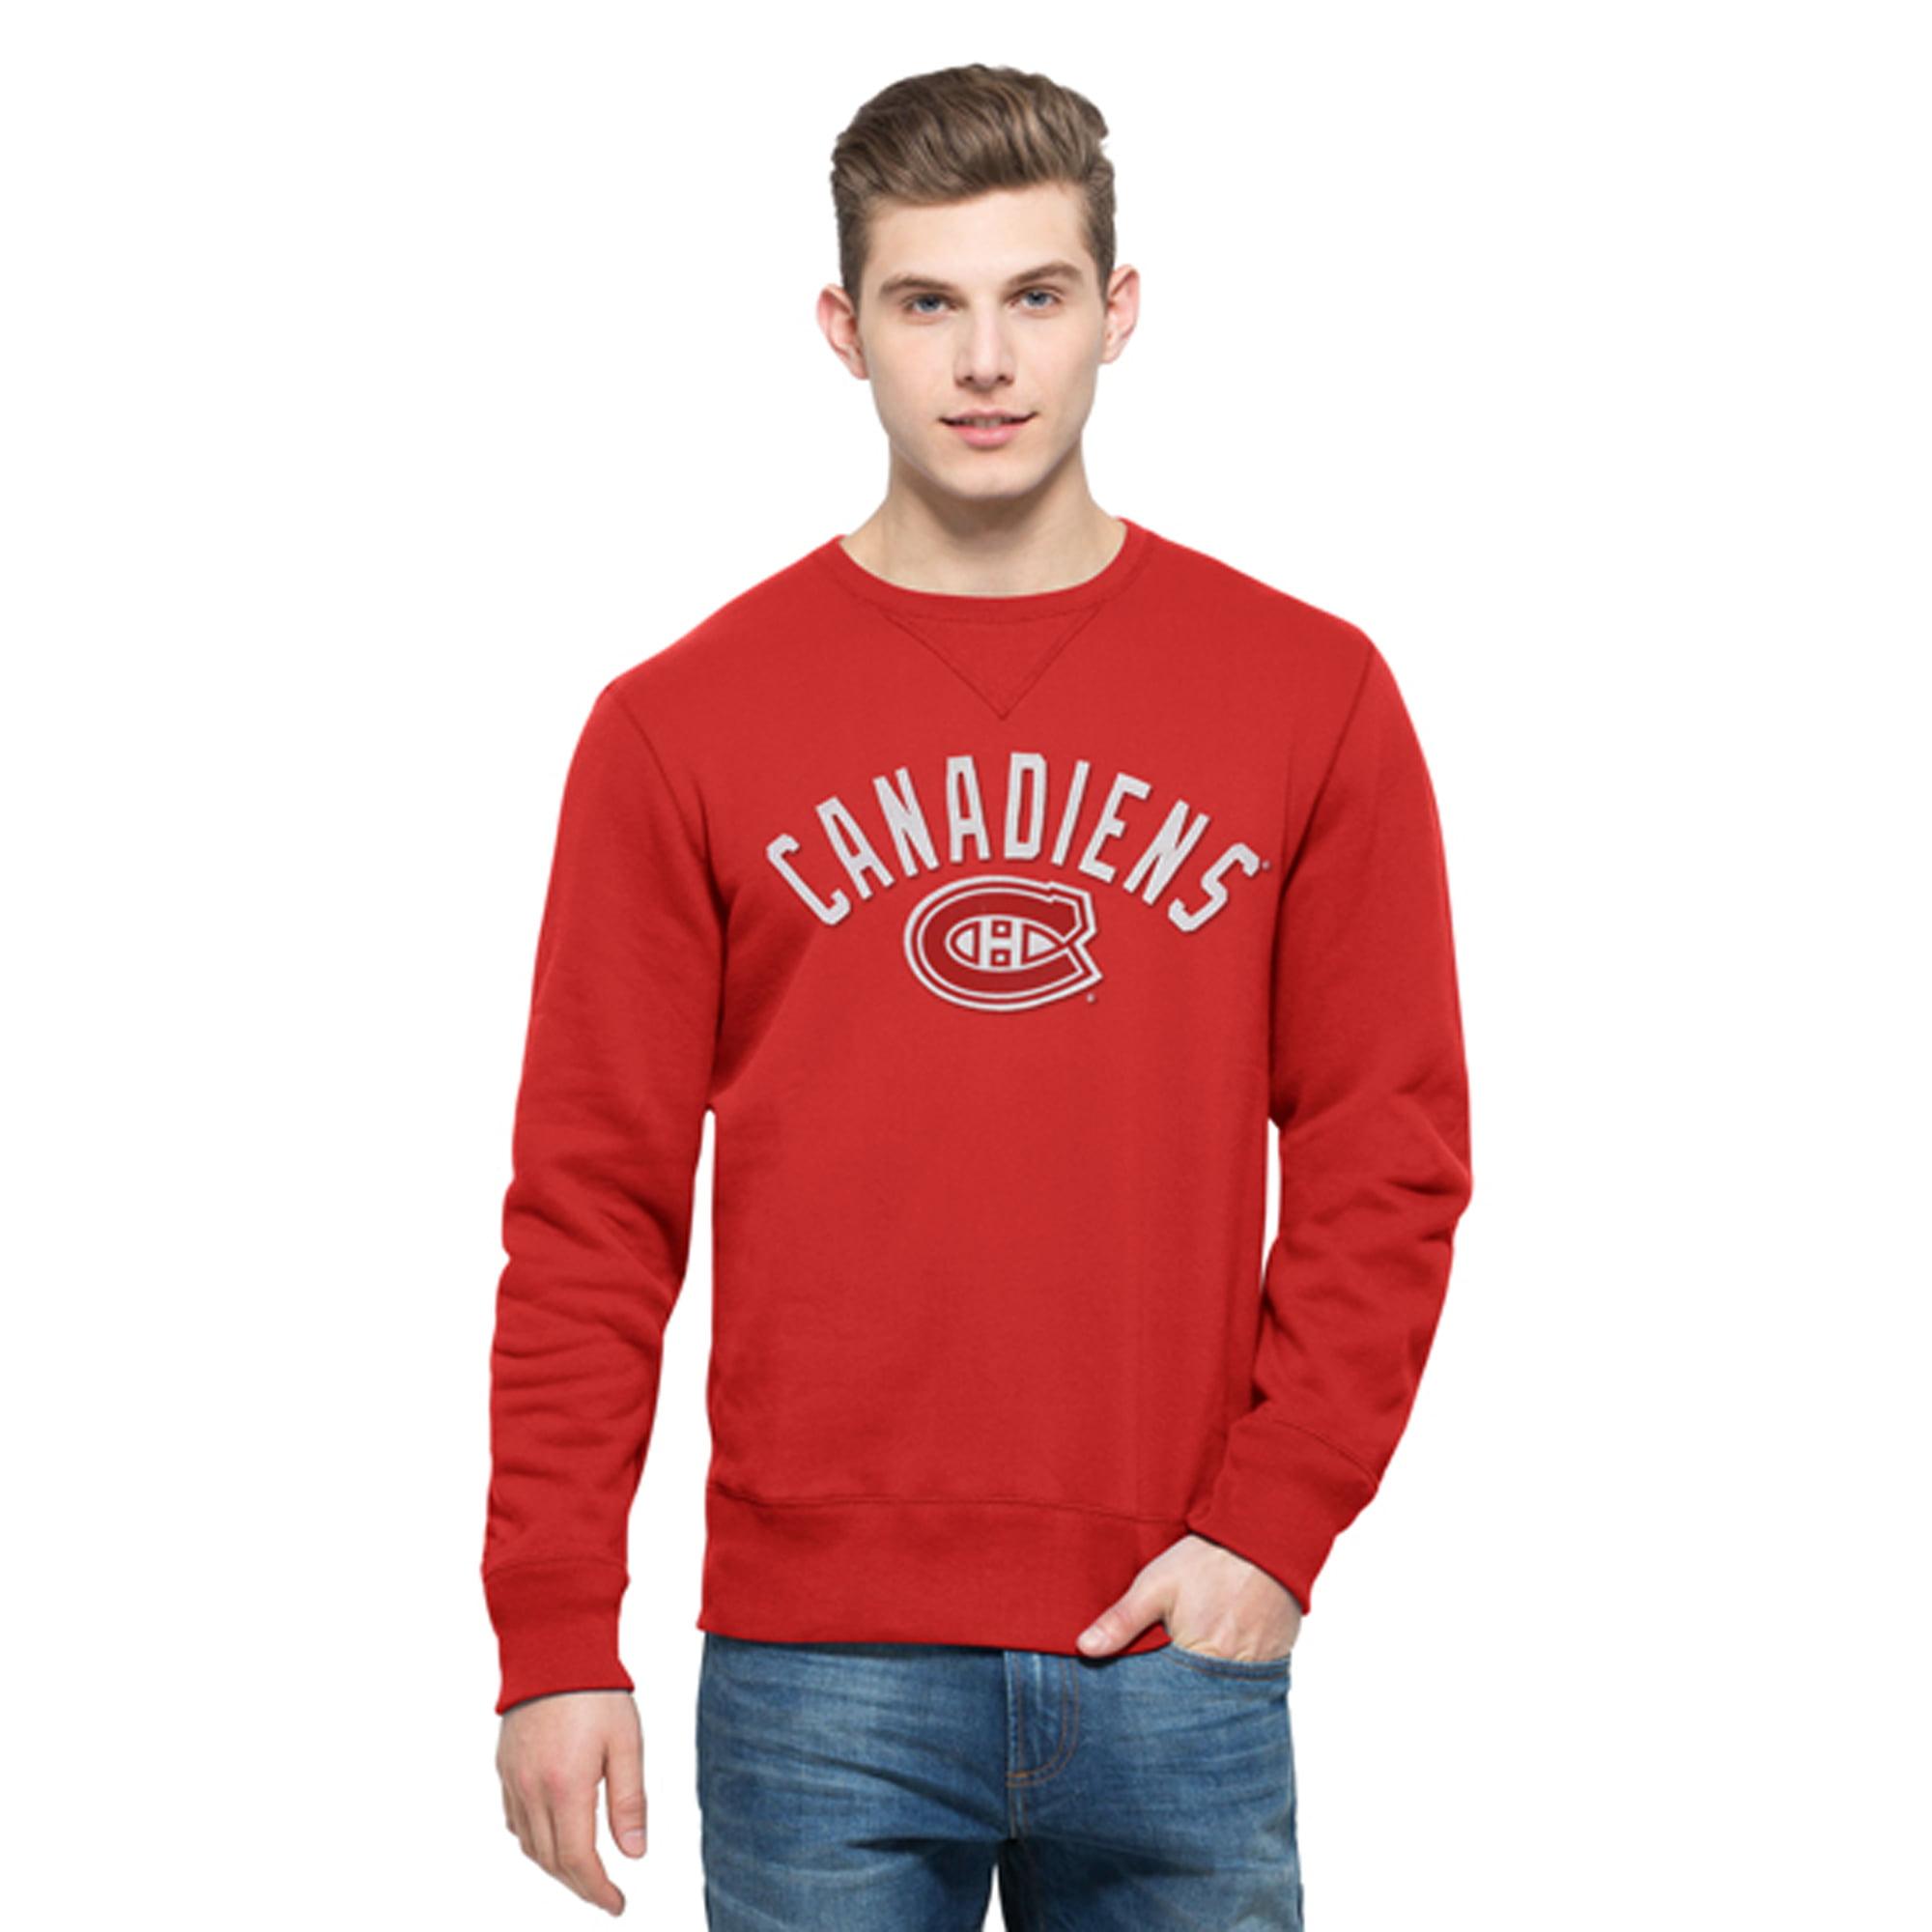 Montreal Canadiens '47 Cross-Check Sweatshirt - Red